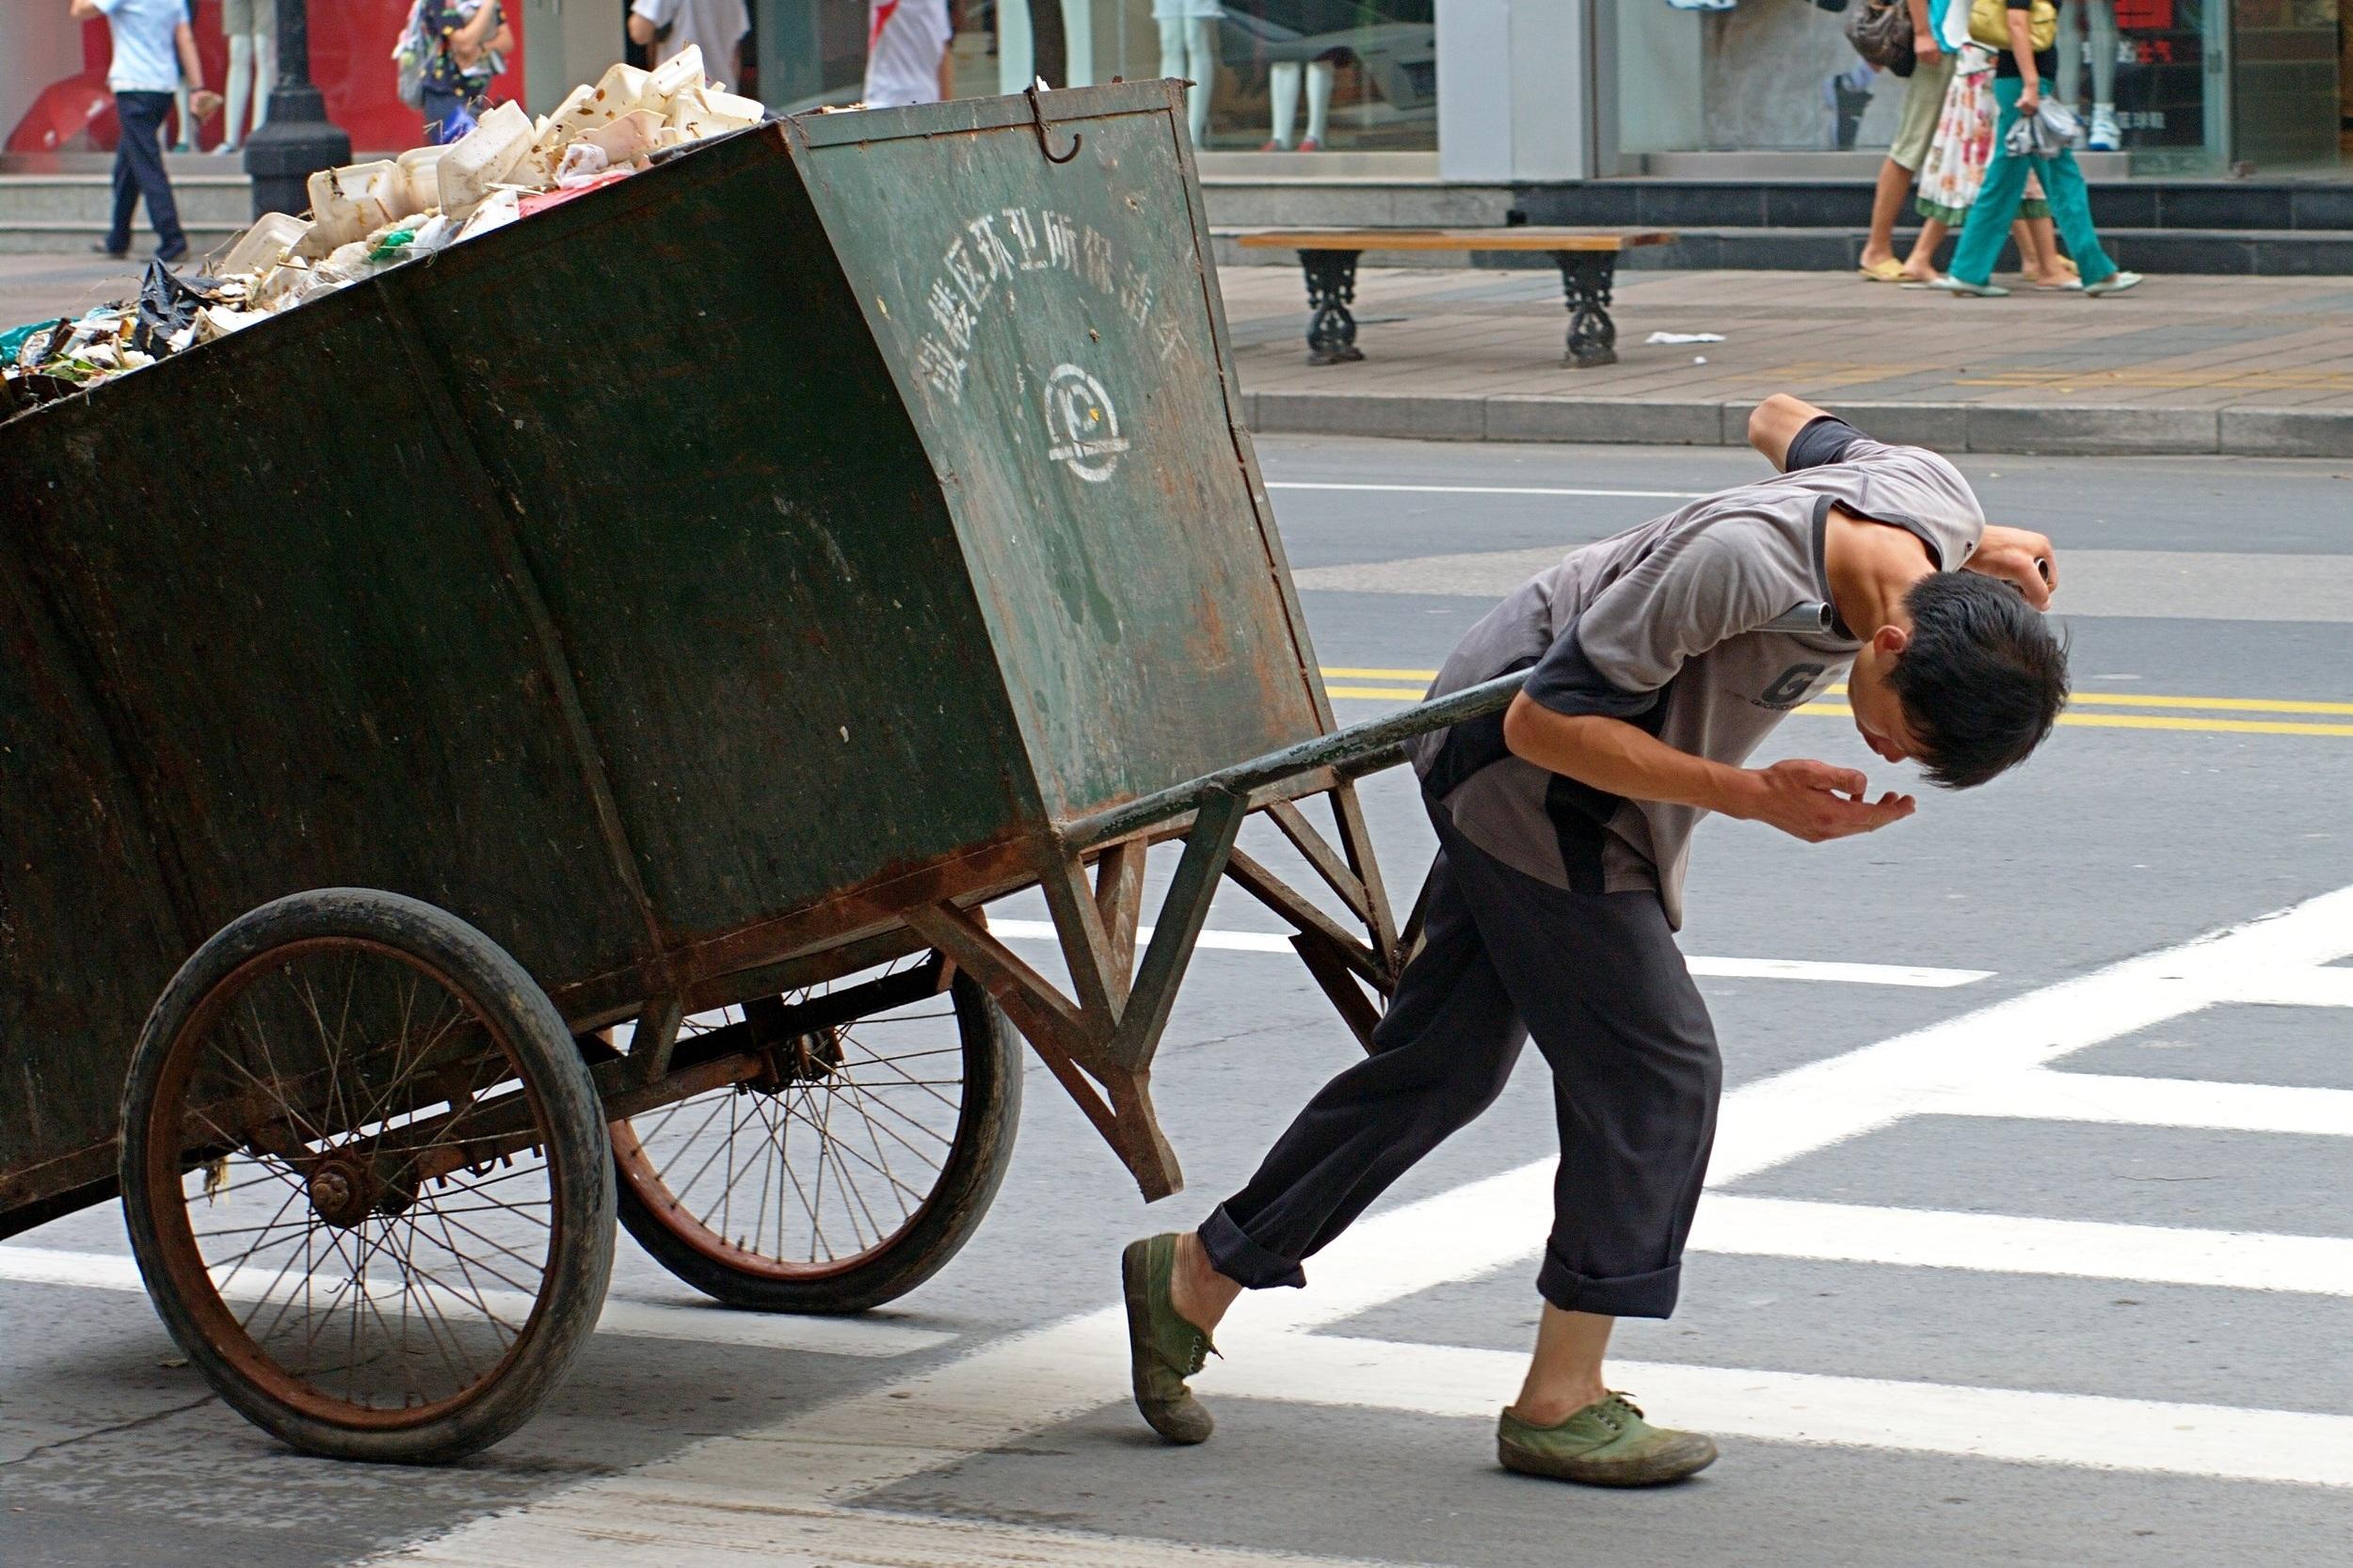 A_man_is_suffering_pulling_a_trash.jpg